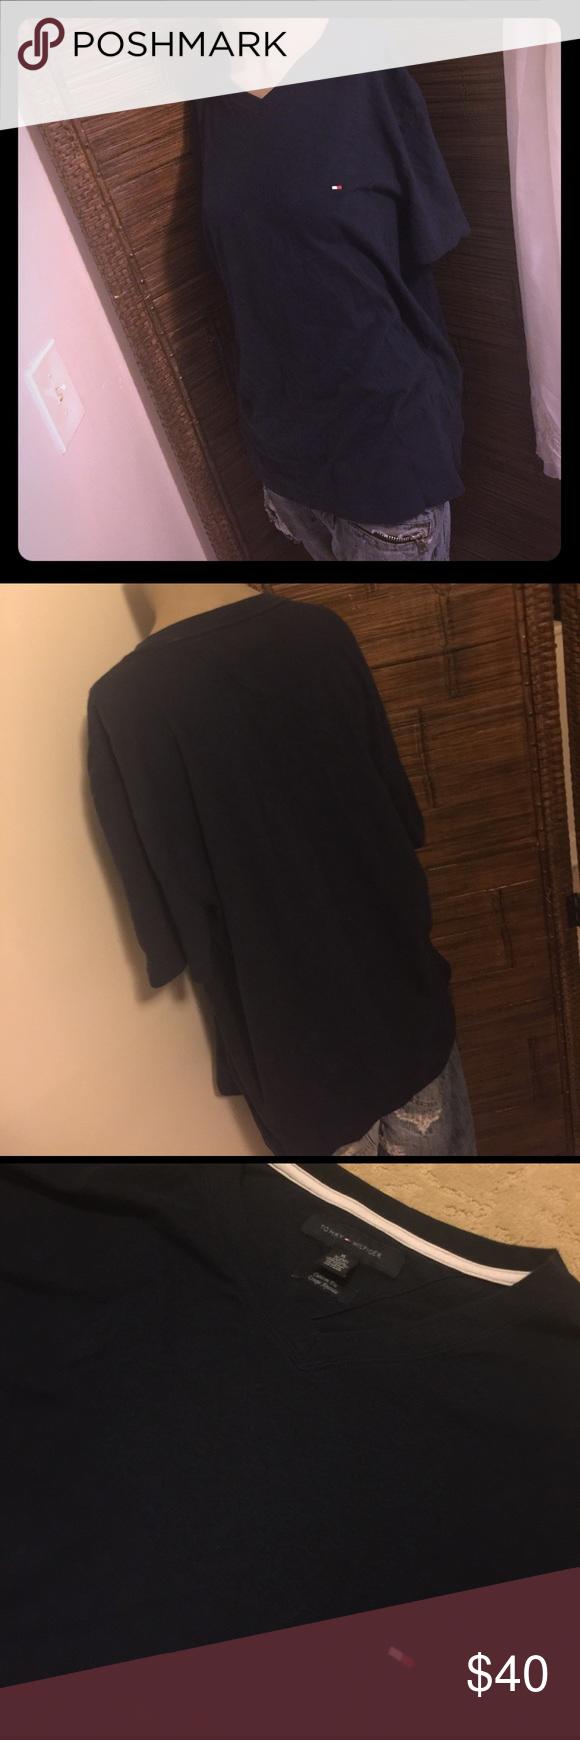 TOMMY HILFIGER V NECK TSHIRT NAVY XL CUSTOM FIT Tommy Hilfiger v neck TSHIRT navy Blue size XL for like a M L Mens Custom Fit Tommy Hilfiger Shirts Tees - Short Sleeve